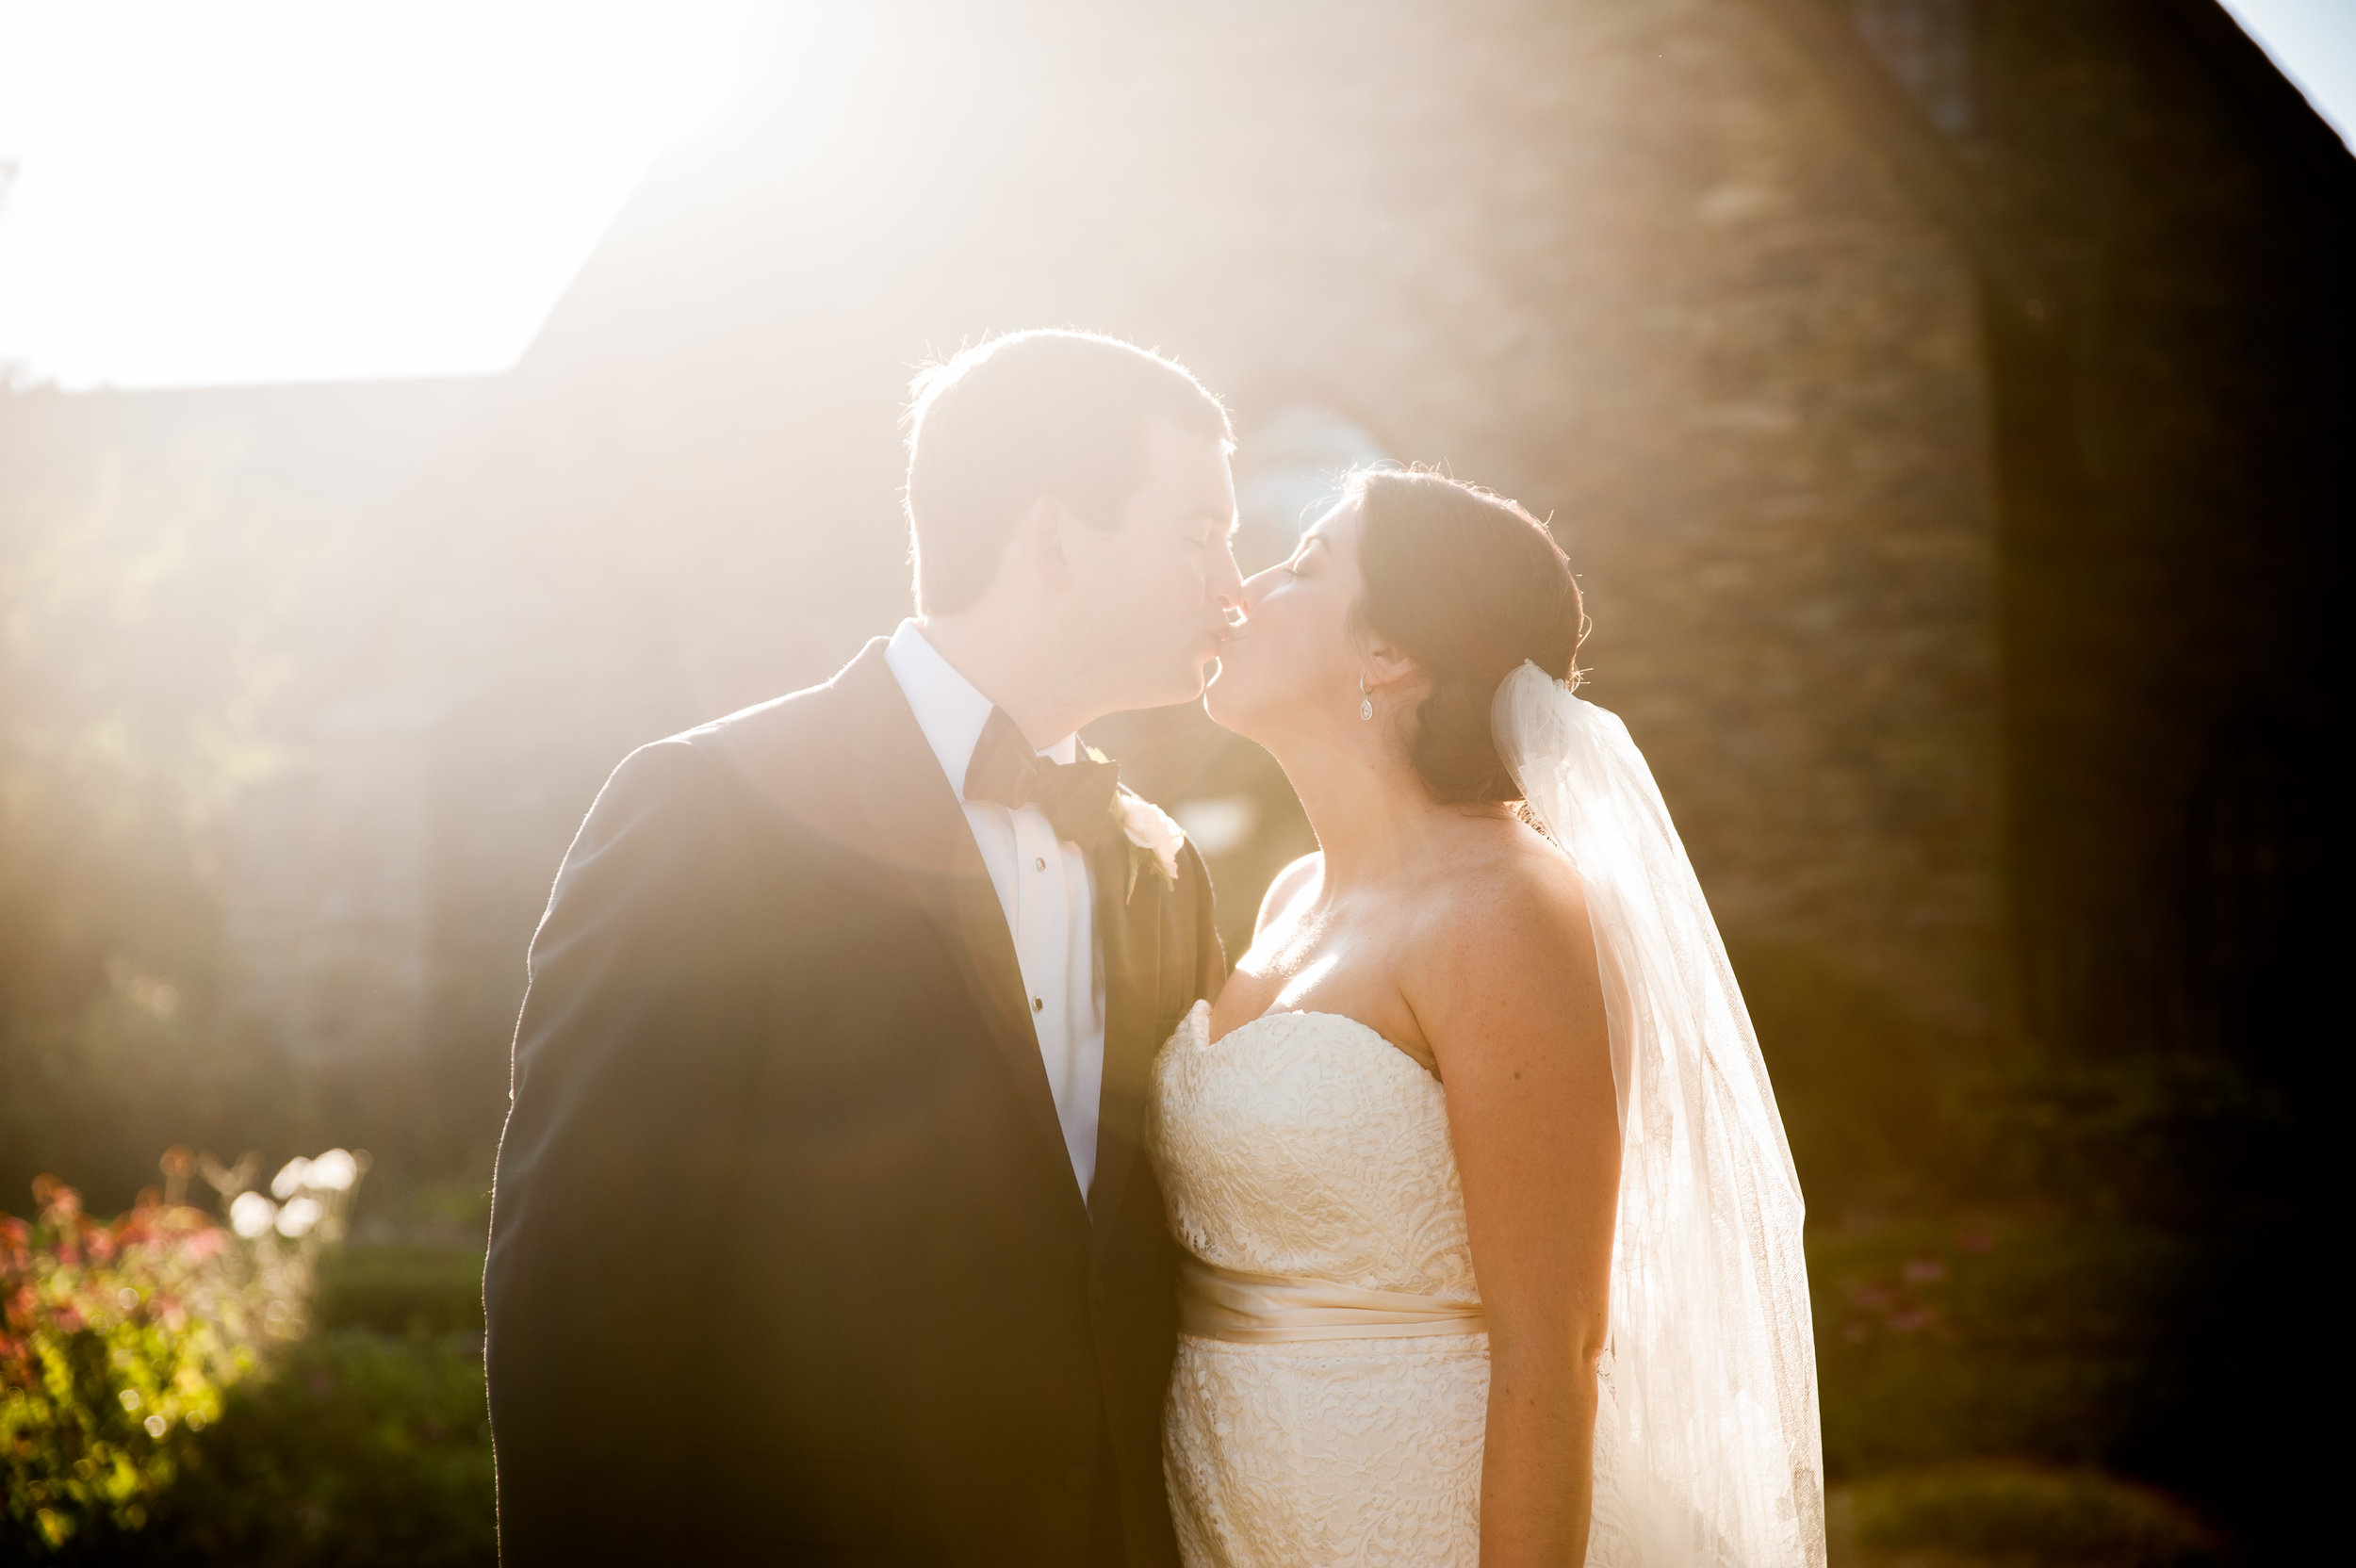 sara-daniel-wedding-featured-image-7328.jpg